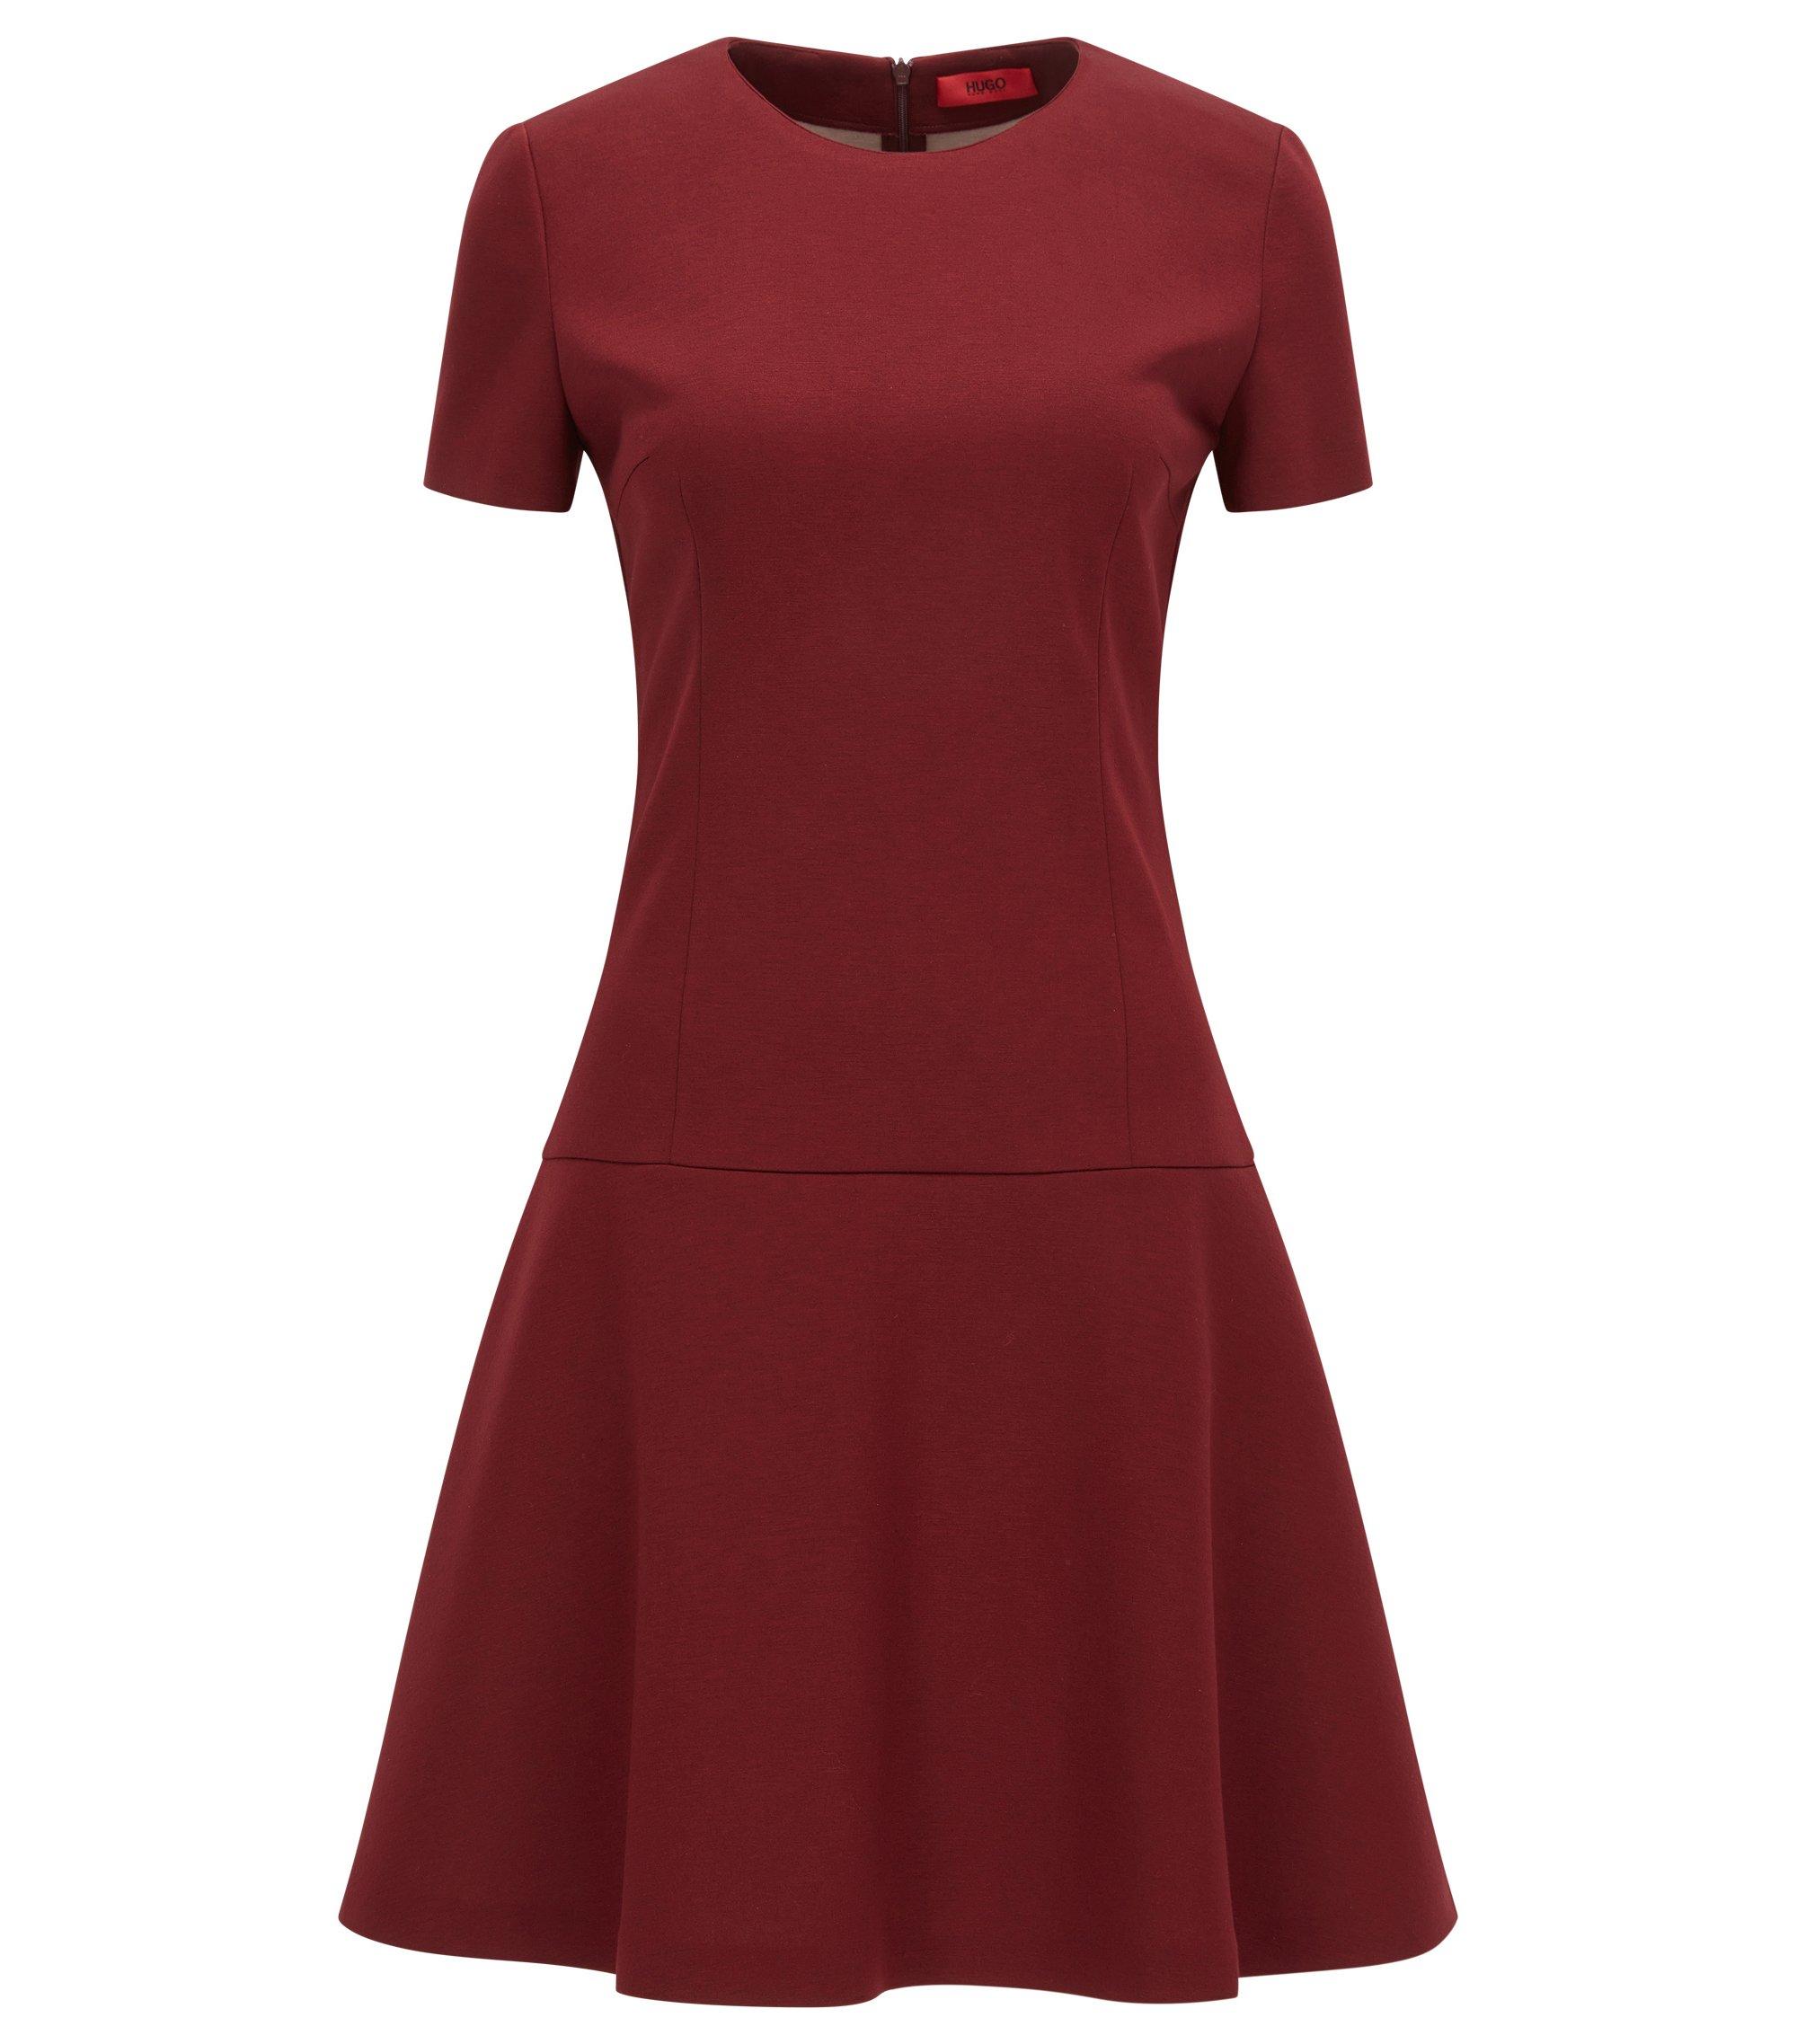 Robe à taille basse en jersey thermocollé, Rouge sombre